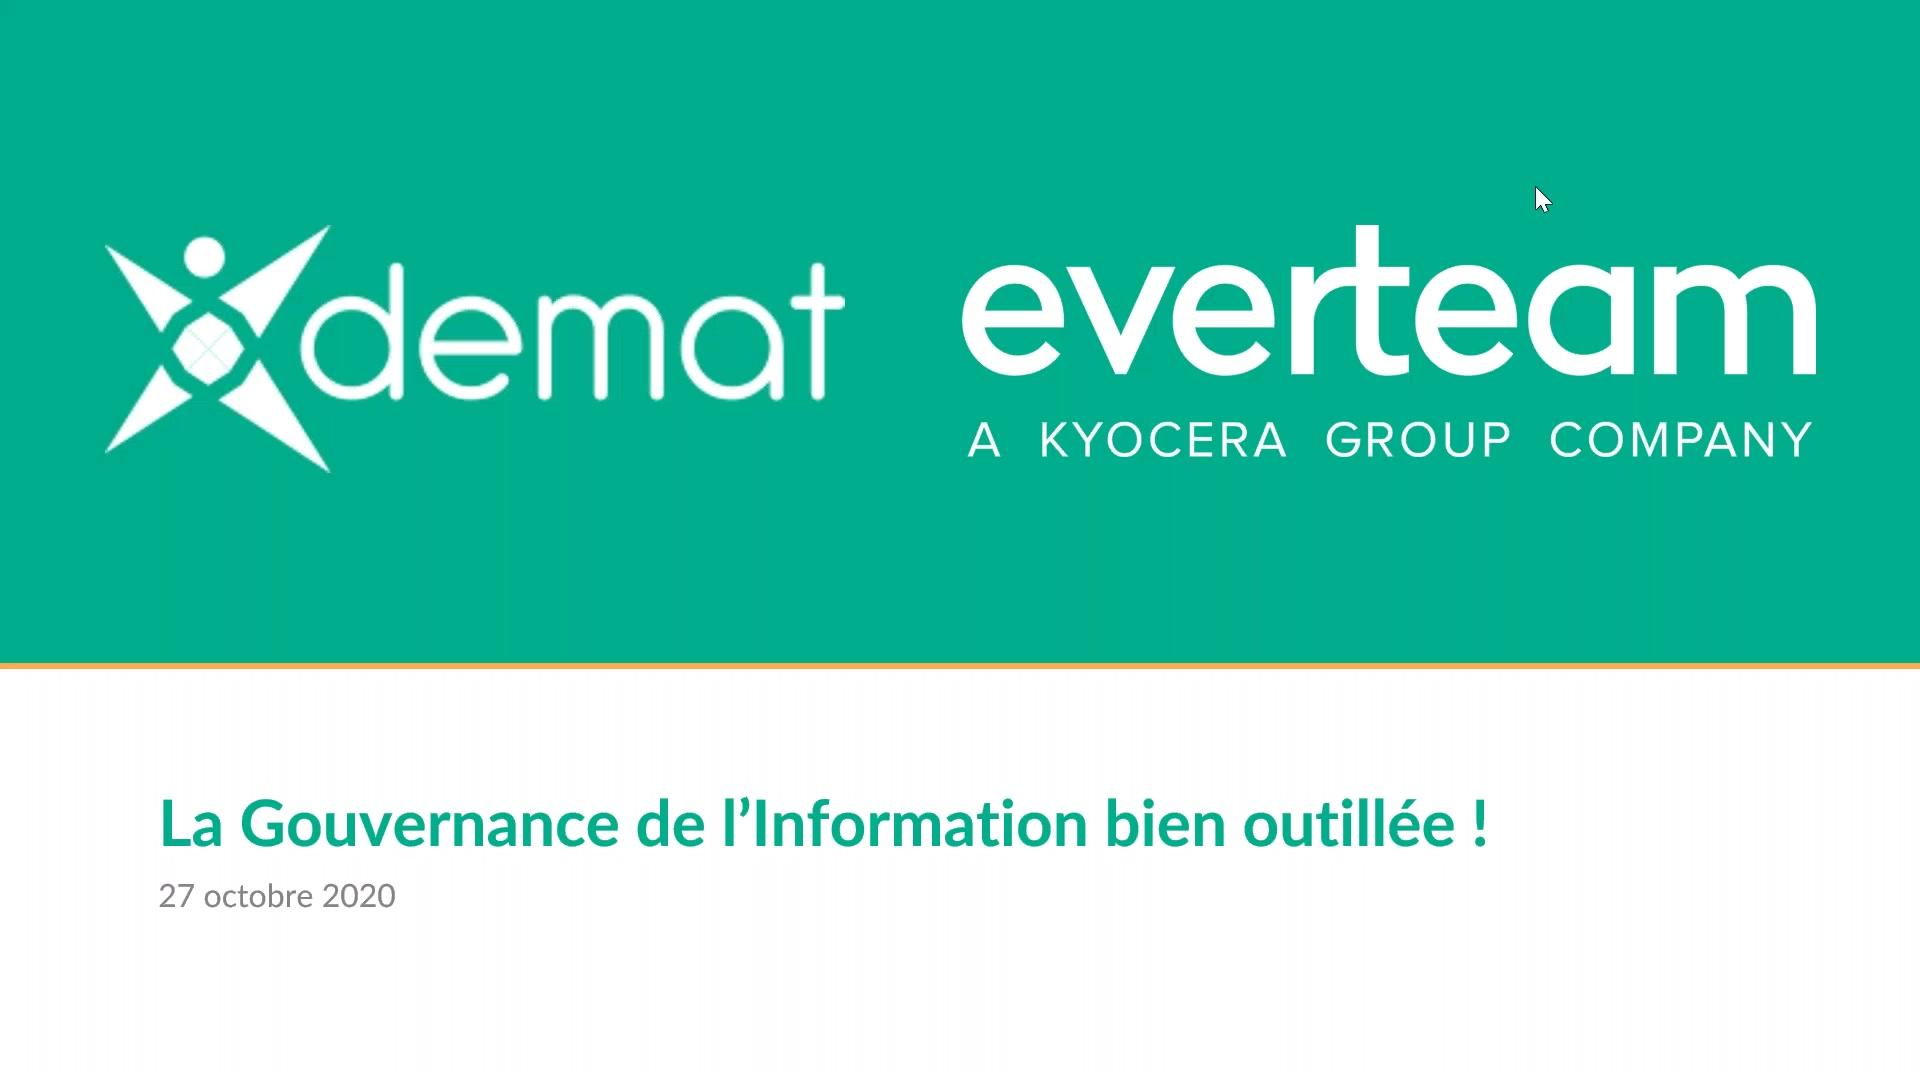 Atelier everteam.policy